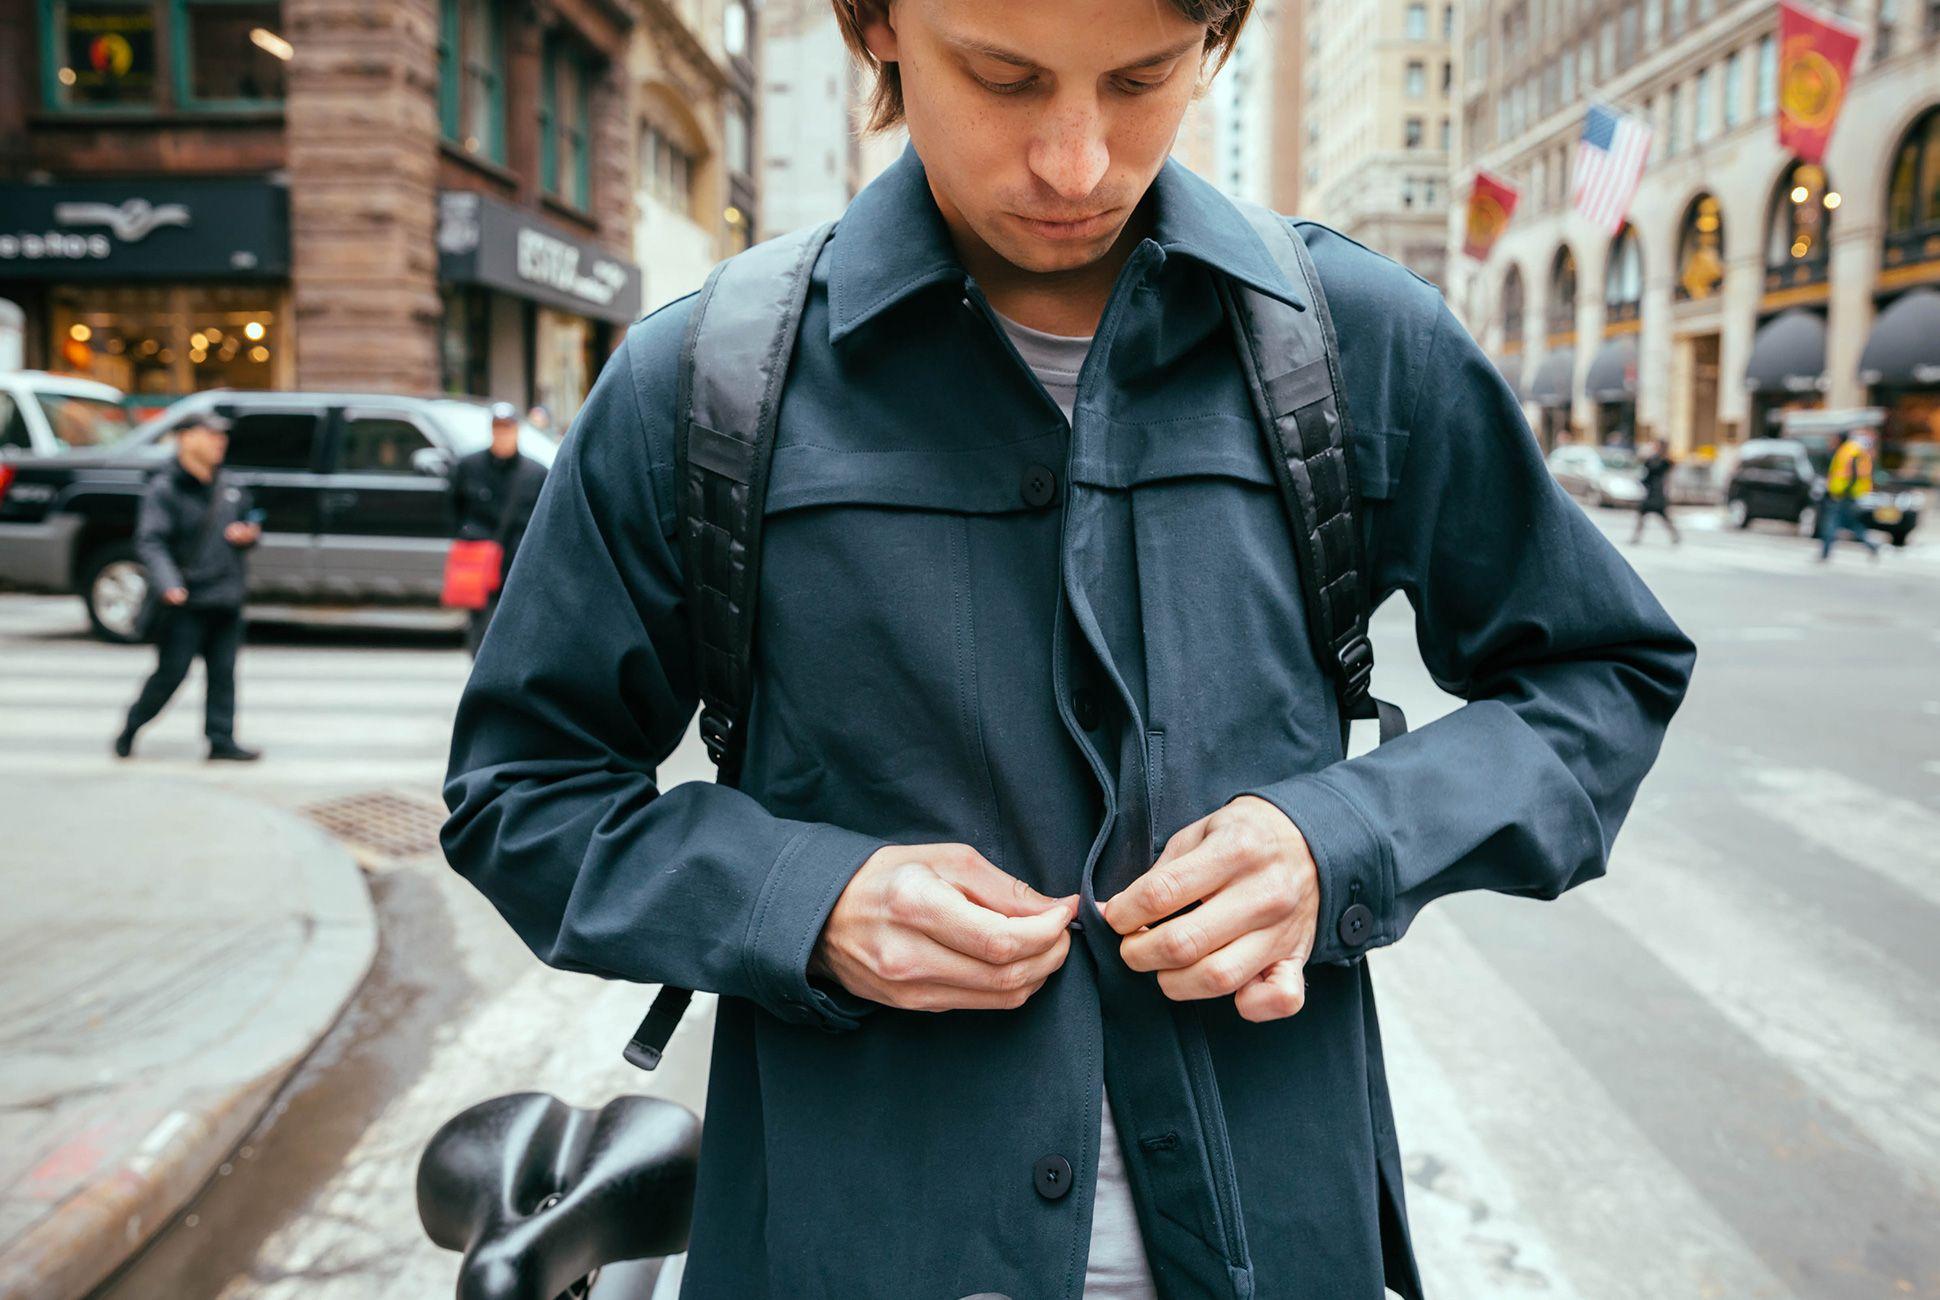 bike-commuter-outfit-gear-patrol-outlier-1